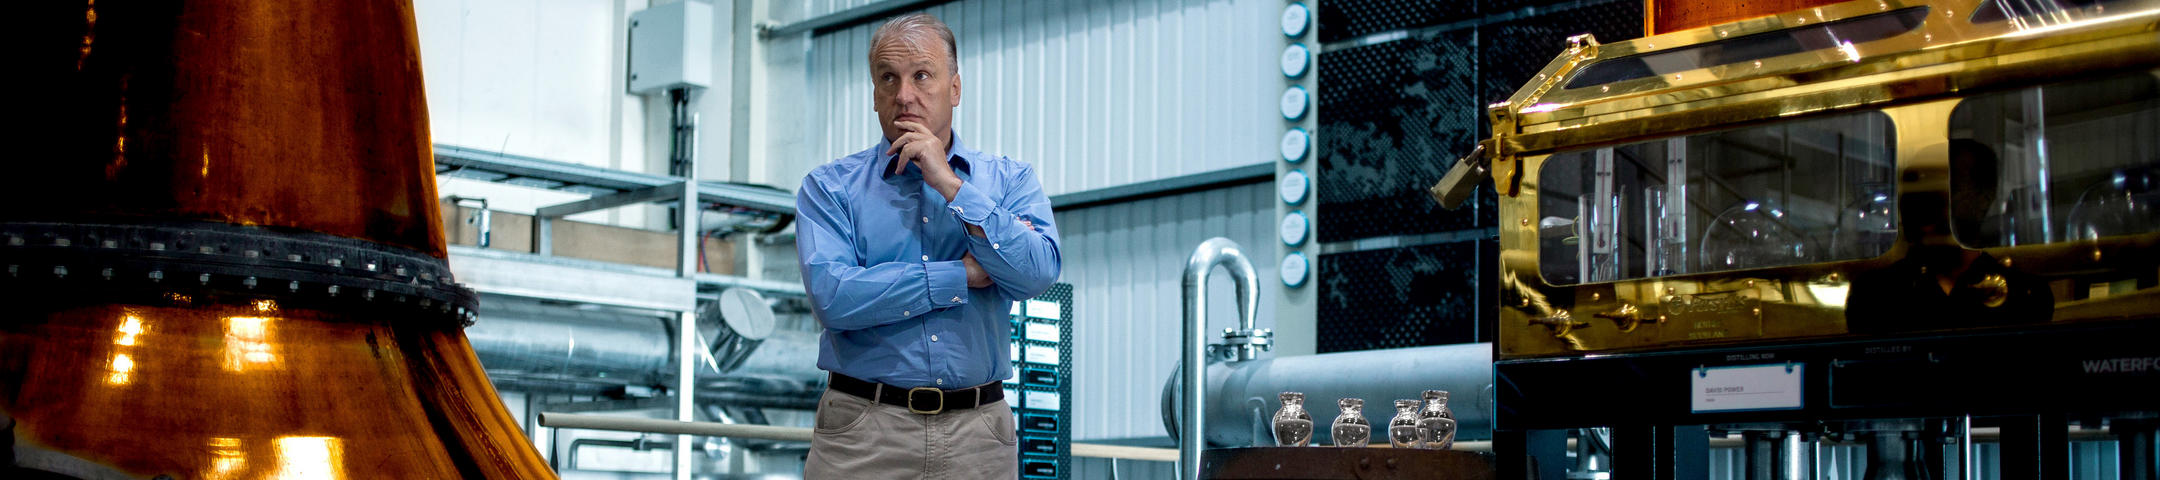 Mark Reynier on Waterford's quest for terroir